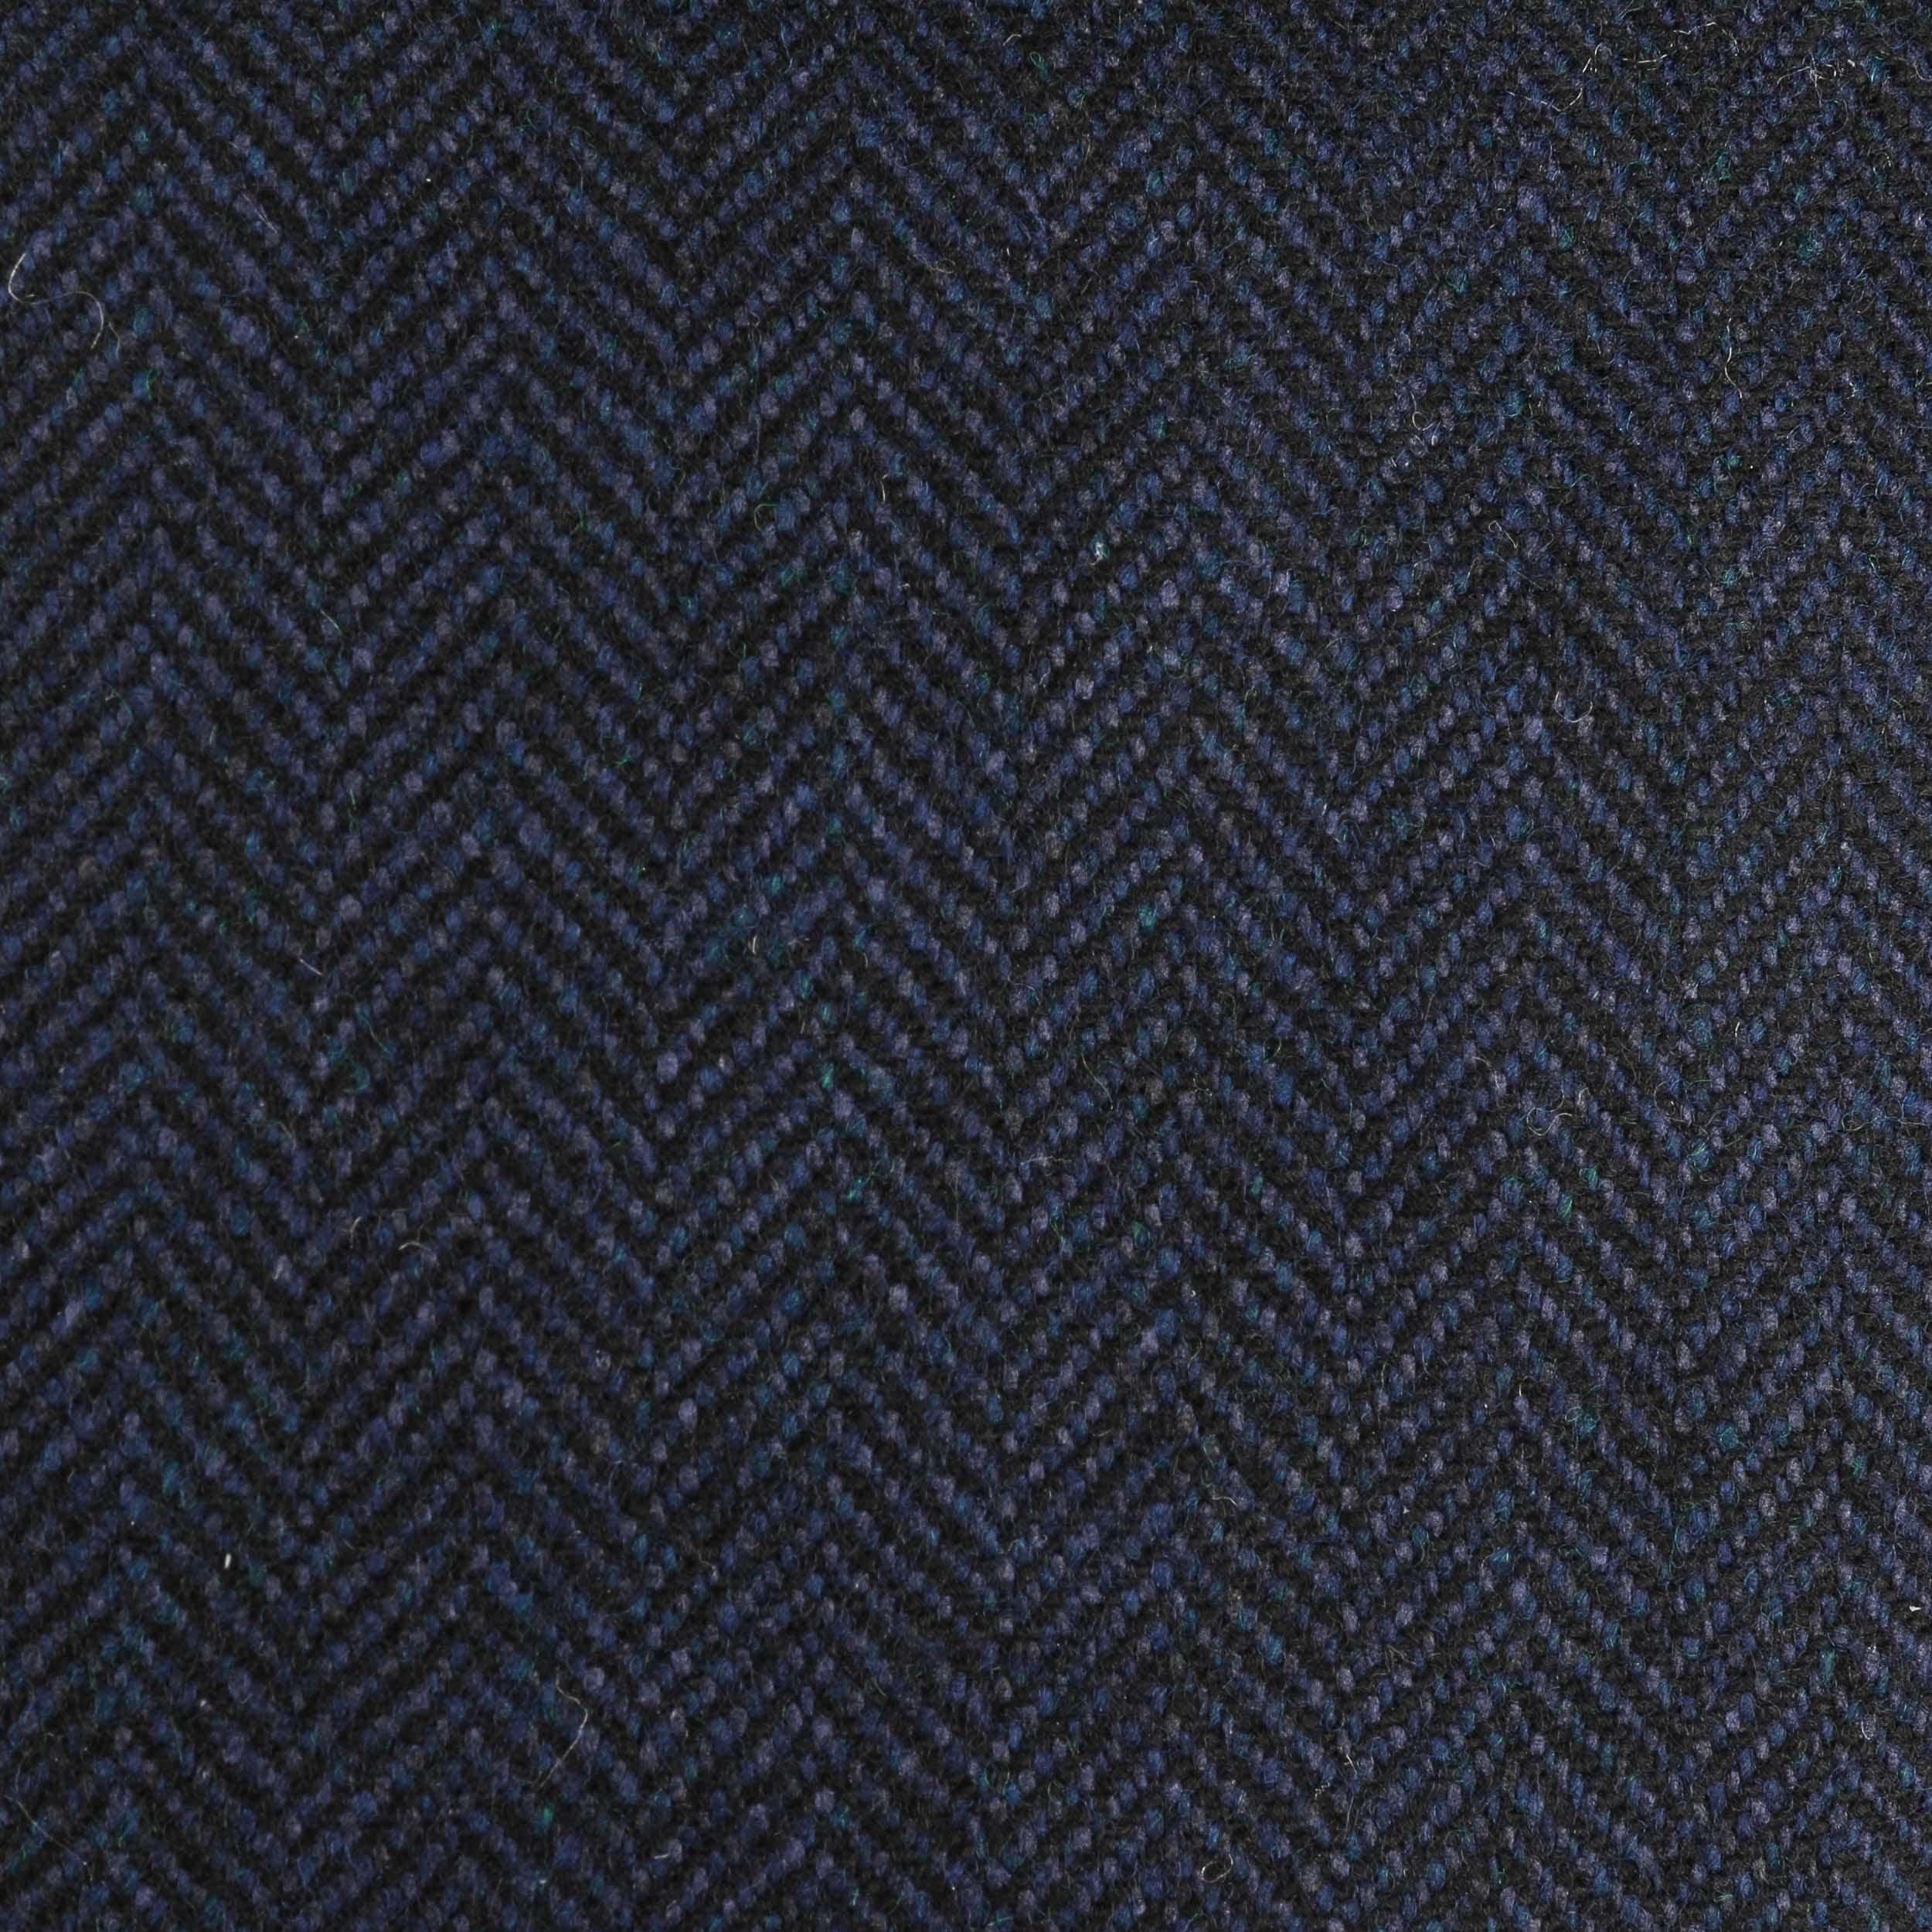 ... Bandera Herringbone Flat Cap by Stetson - navy 4 ... 19bd4bb4e434